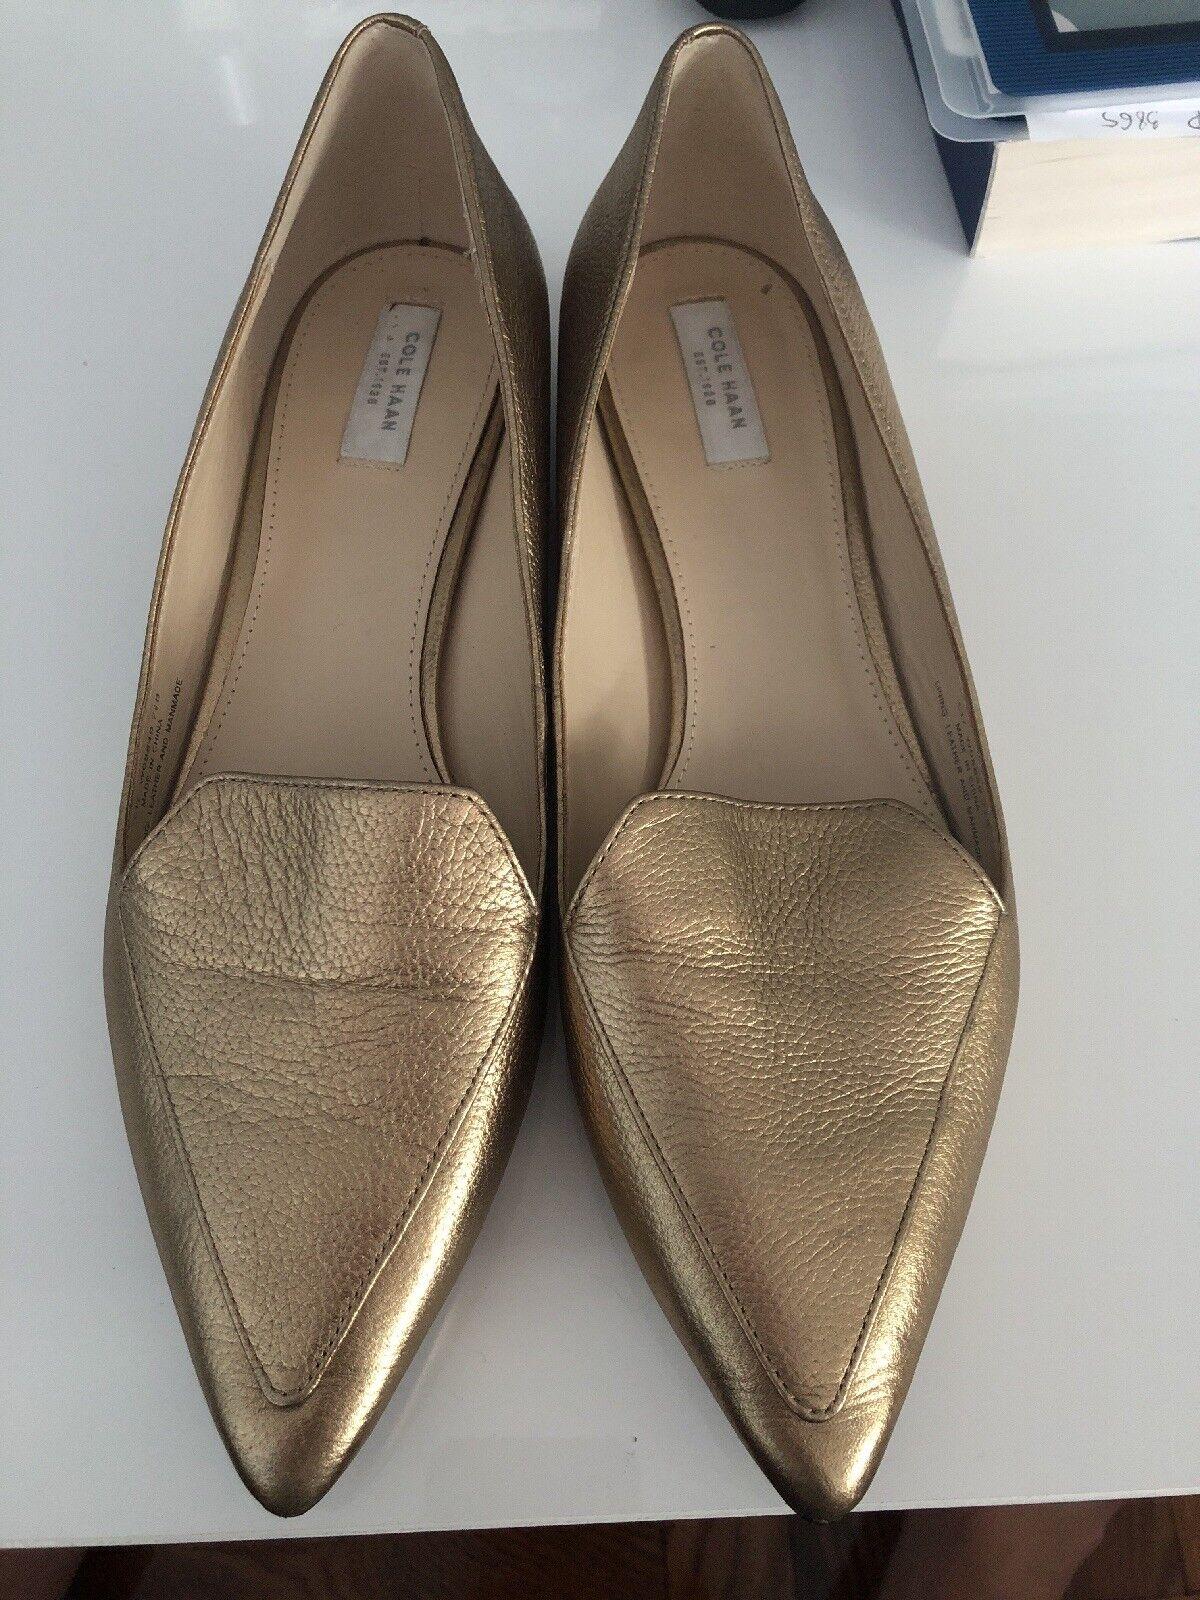 Cole Haan Damenschuhe Schuhes Größe 7.5Gold Metallic Pointy dress schuhe